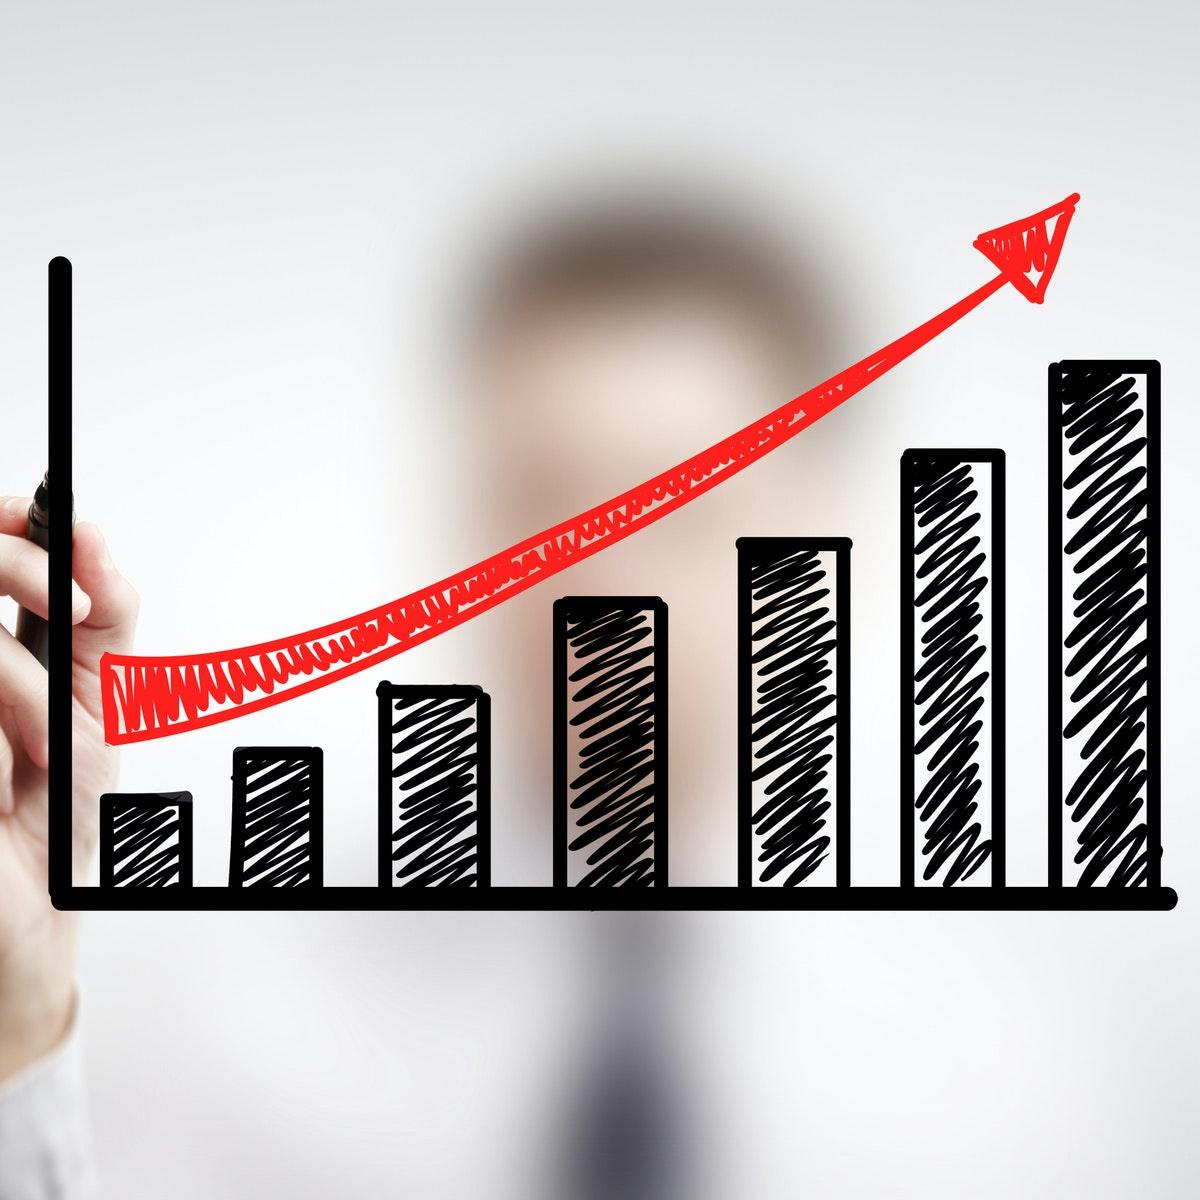 Predictive Modeling and Analytics